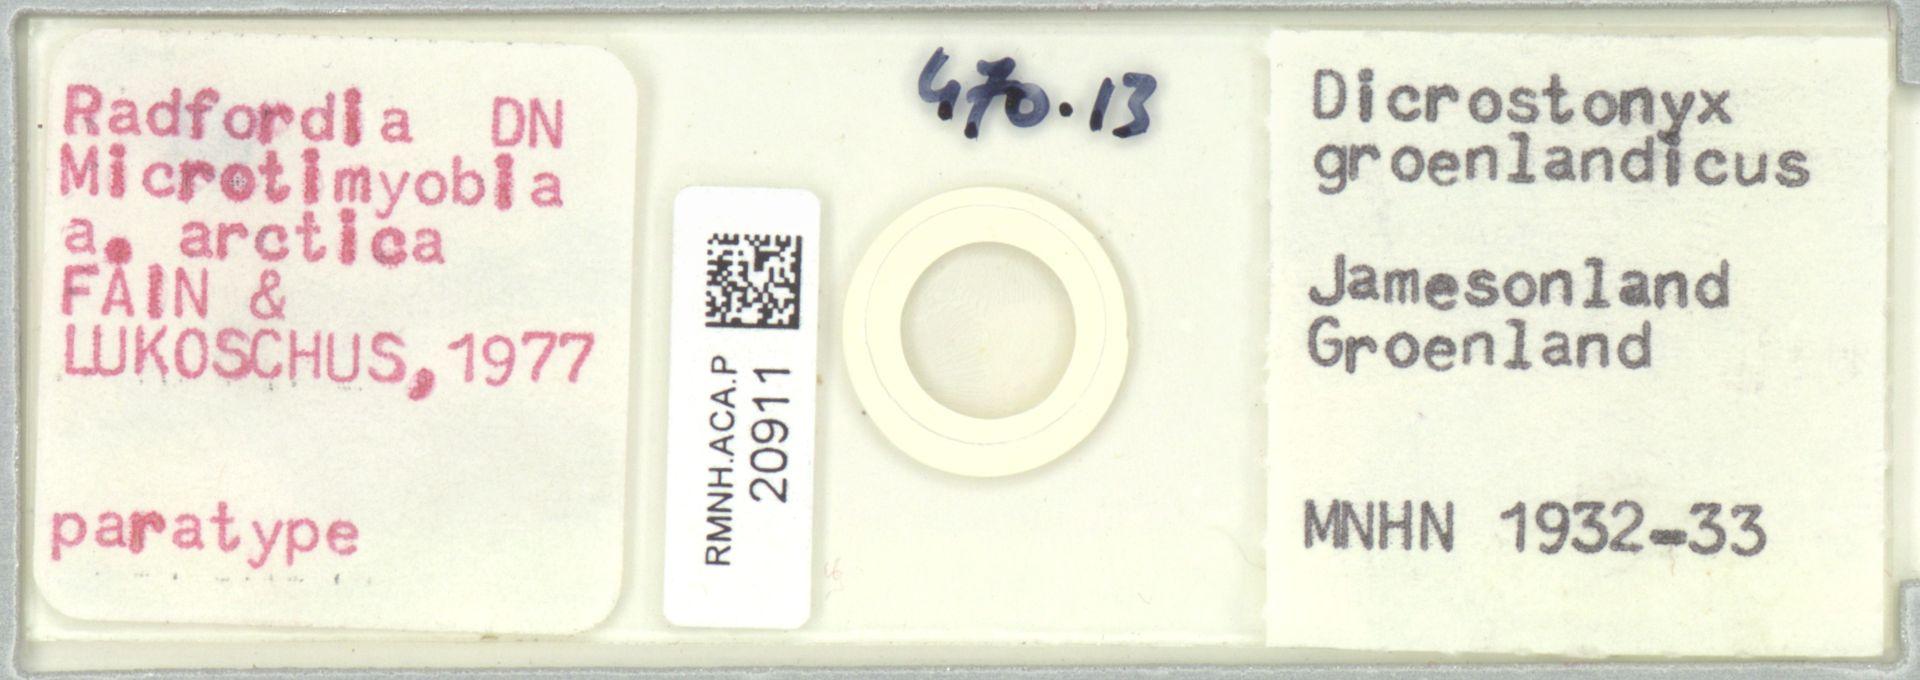 RMNH.ACA.P.20911   Radfordia Fain & Lukoschus, 1977